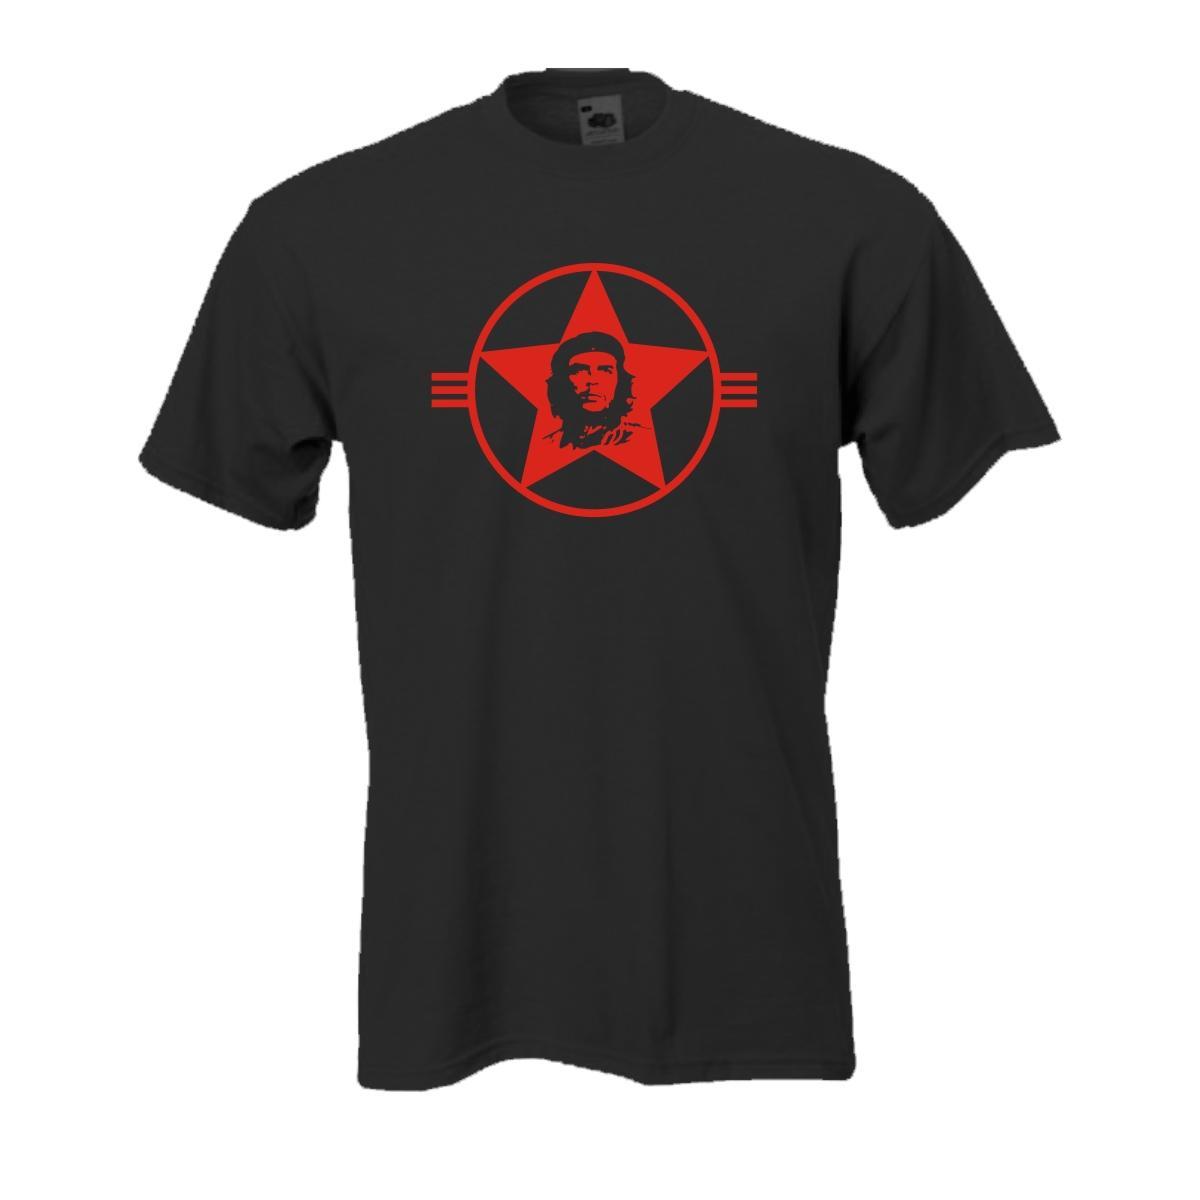 Che-Guevara-cooles-Kult-Fun-T-Shirt-Gr-S-5XL-FS042